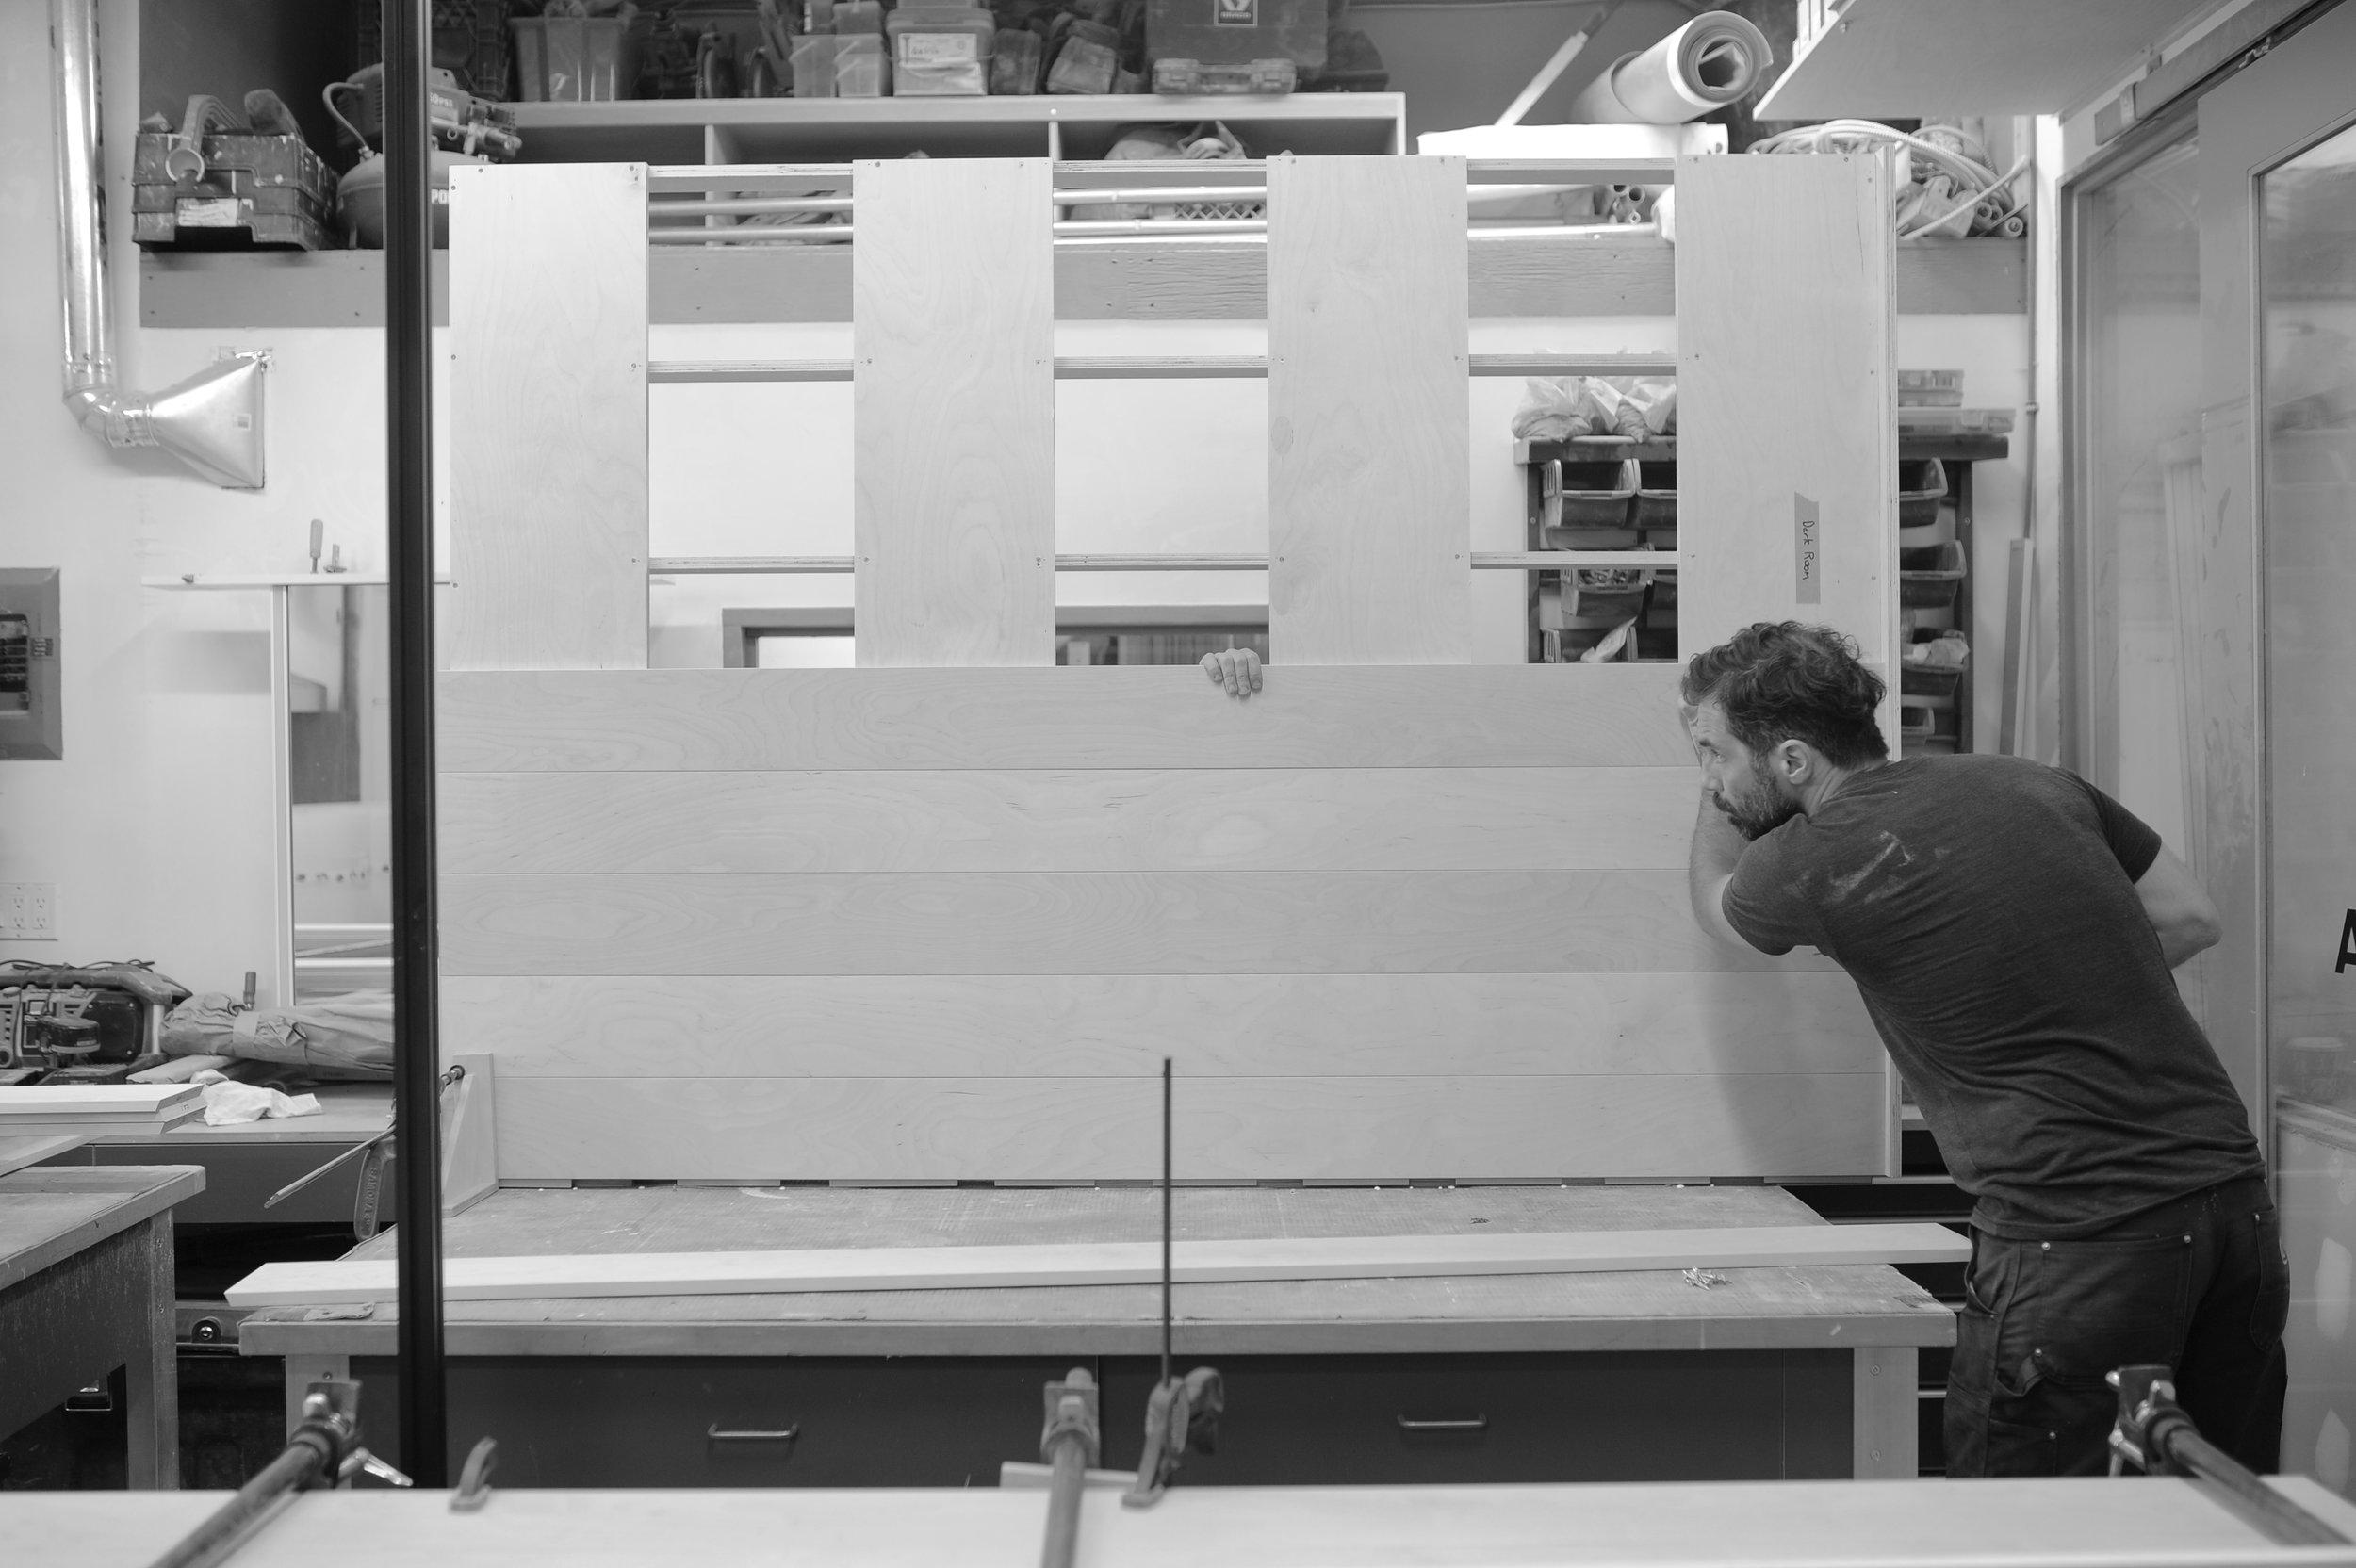 CUSTOM FURNITURE BUILT-IN CABINETRY VANCOUVER ANTHILL STUDIO DESIGN LOCAL